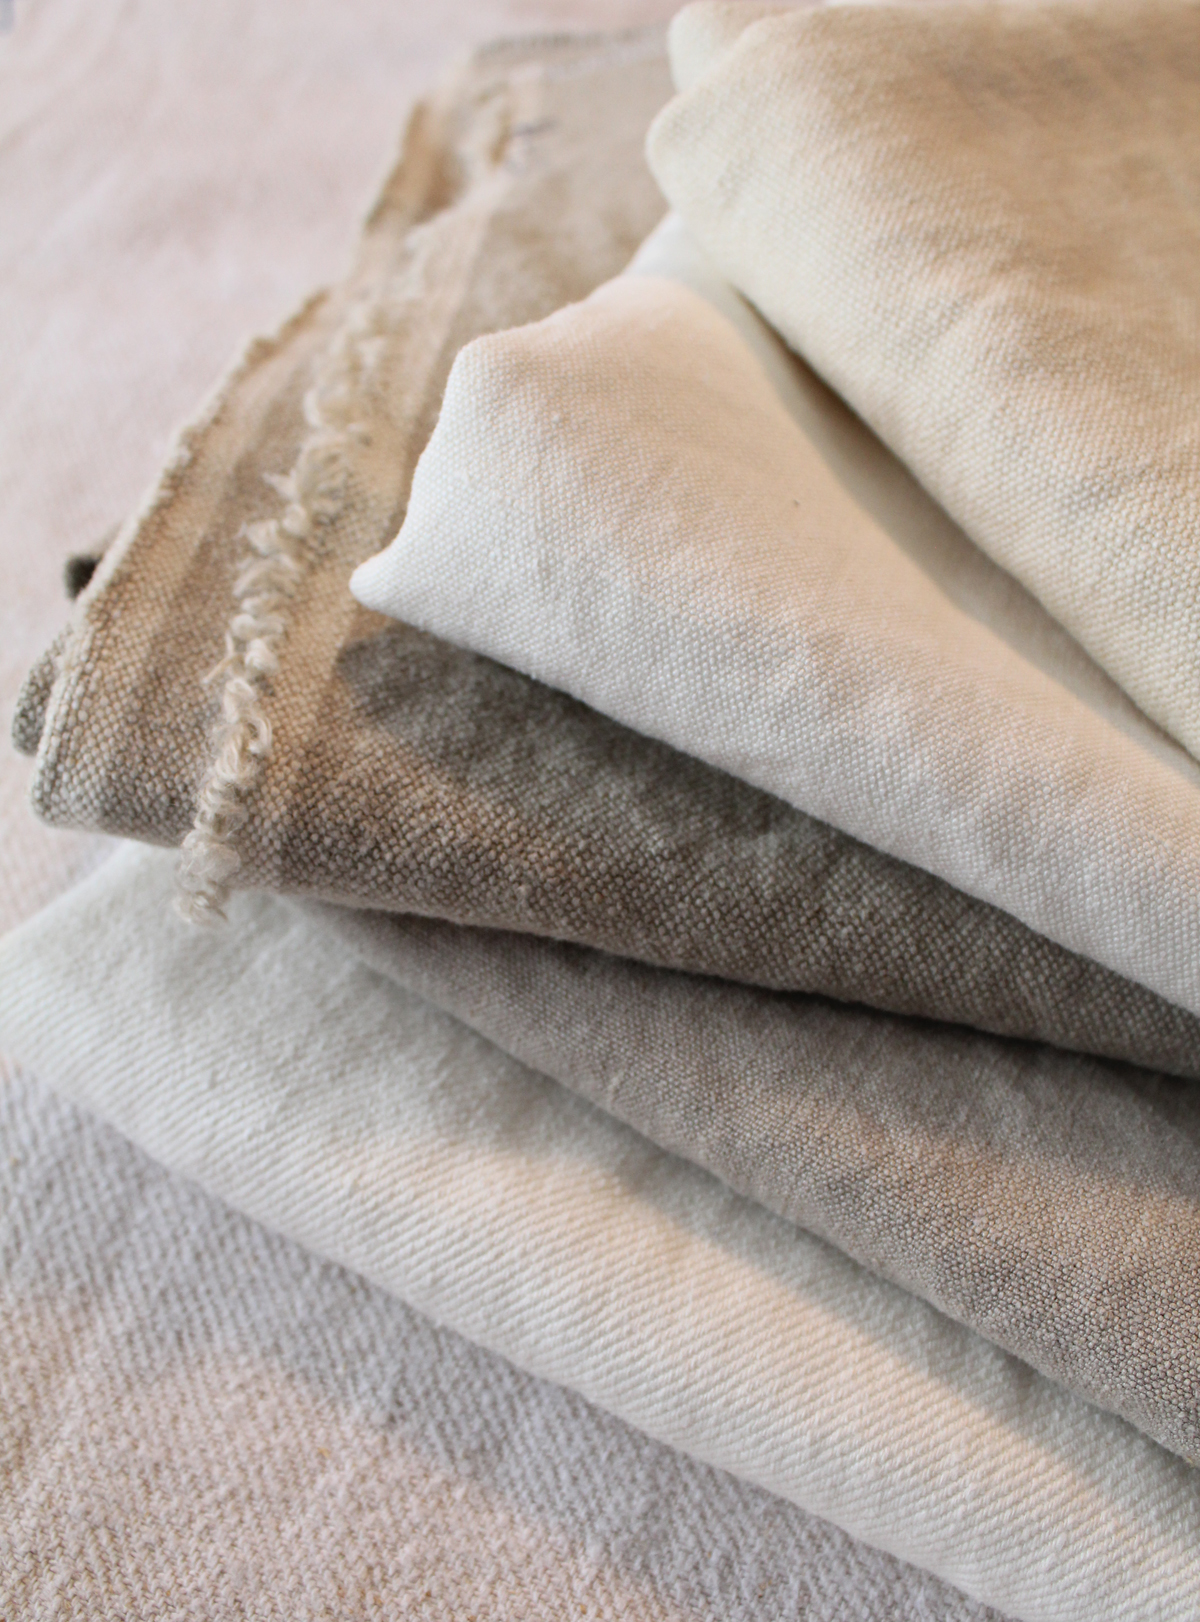 Best Quality & Most Beautiful Hemp Fabrics for Slipcovers